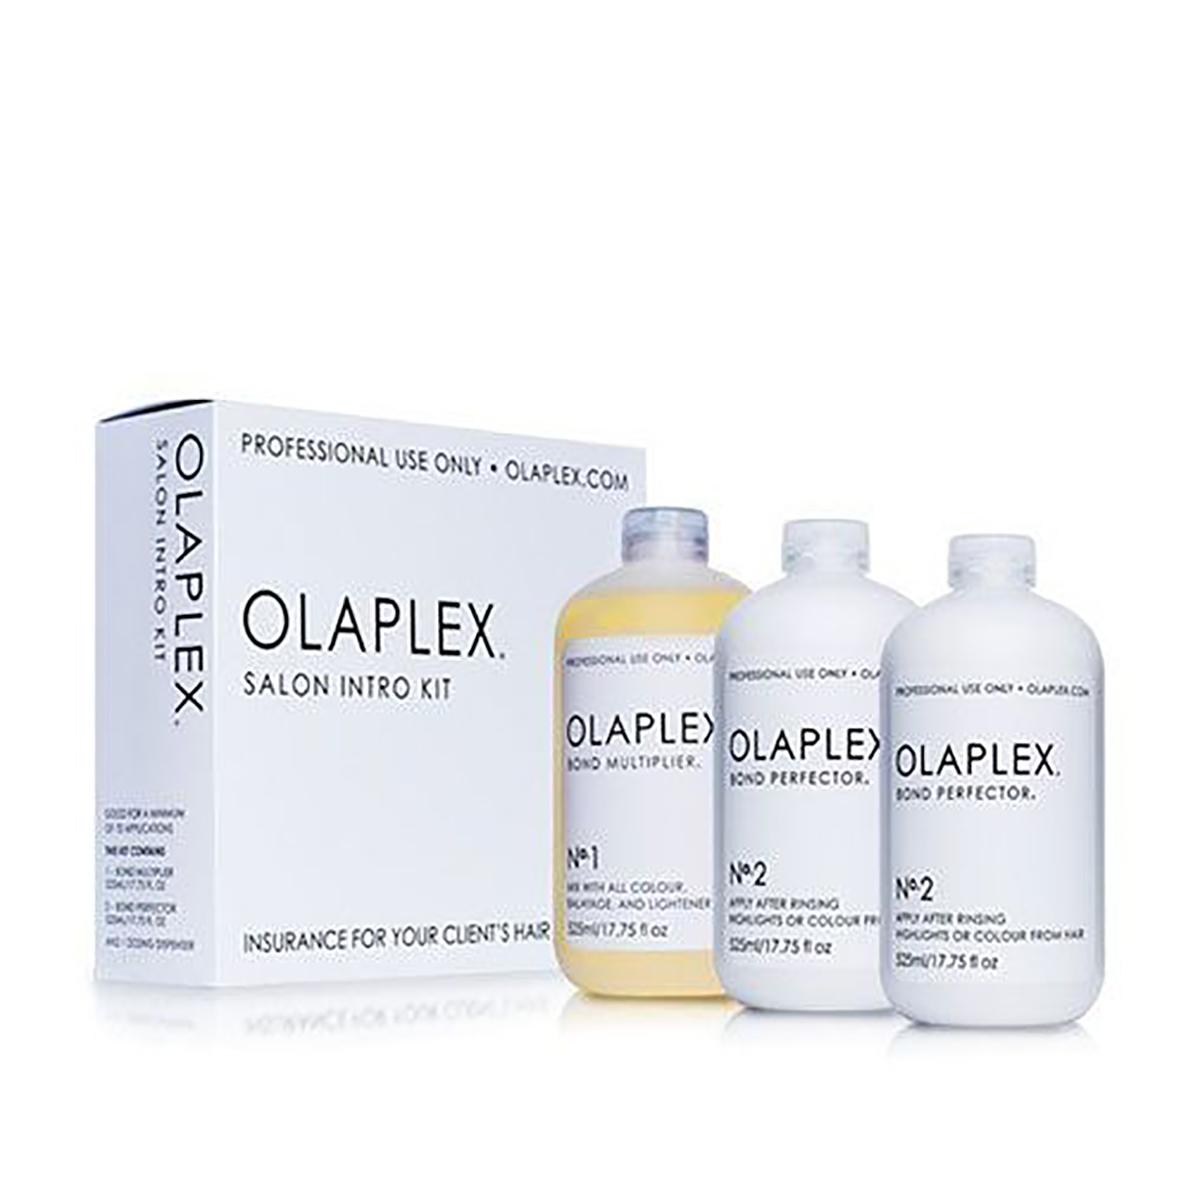 01 Olaplex Salon Intro Kit N1 e N2